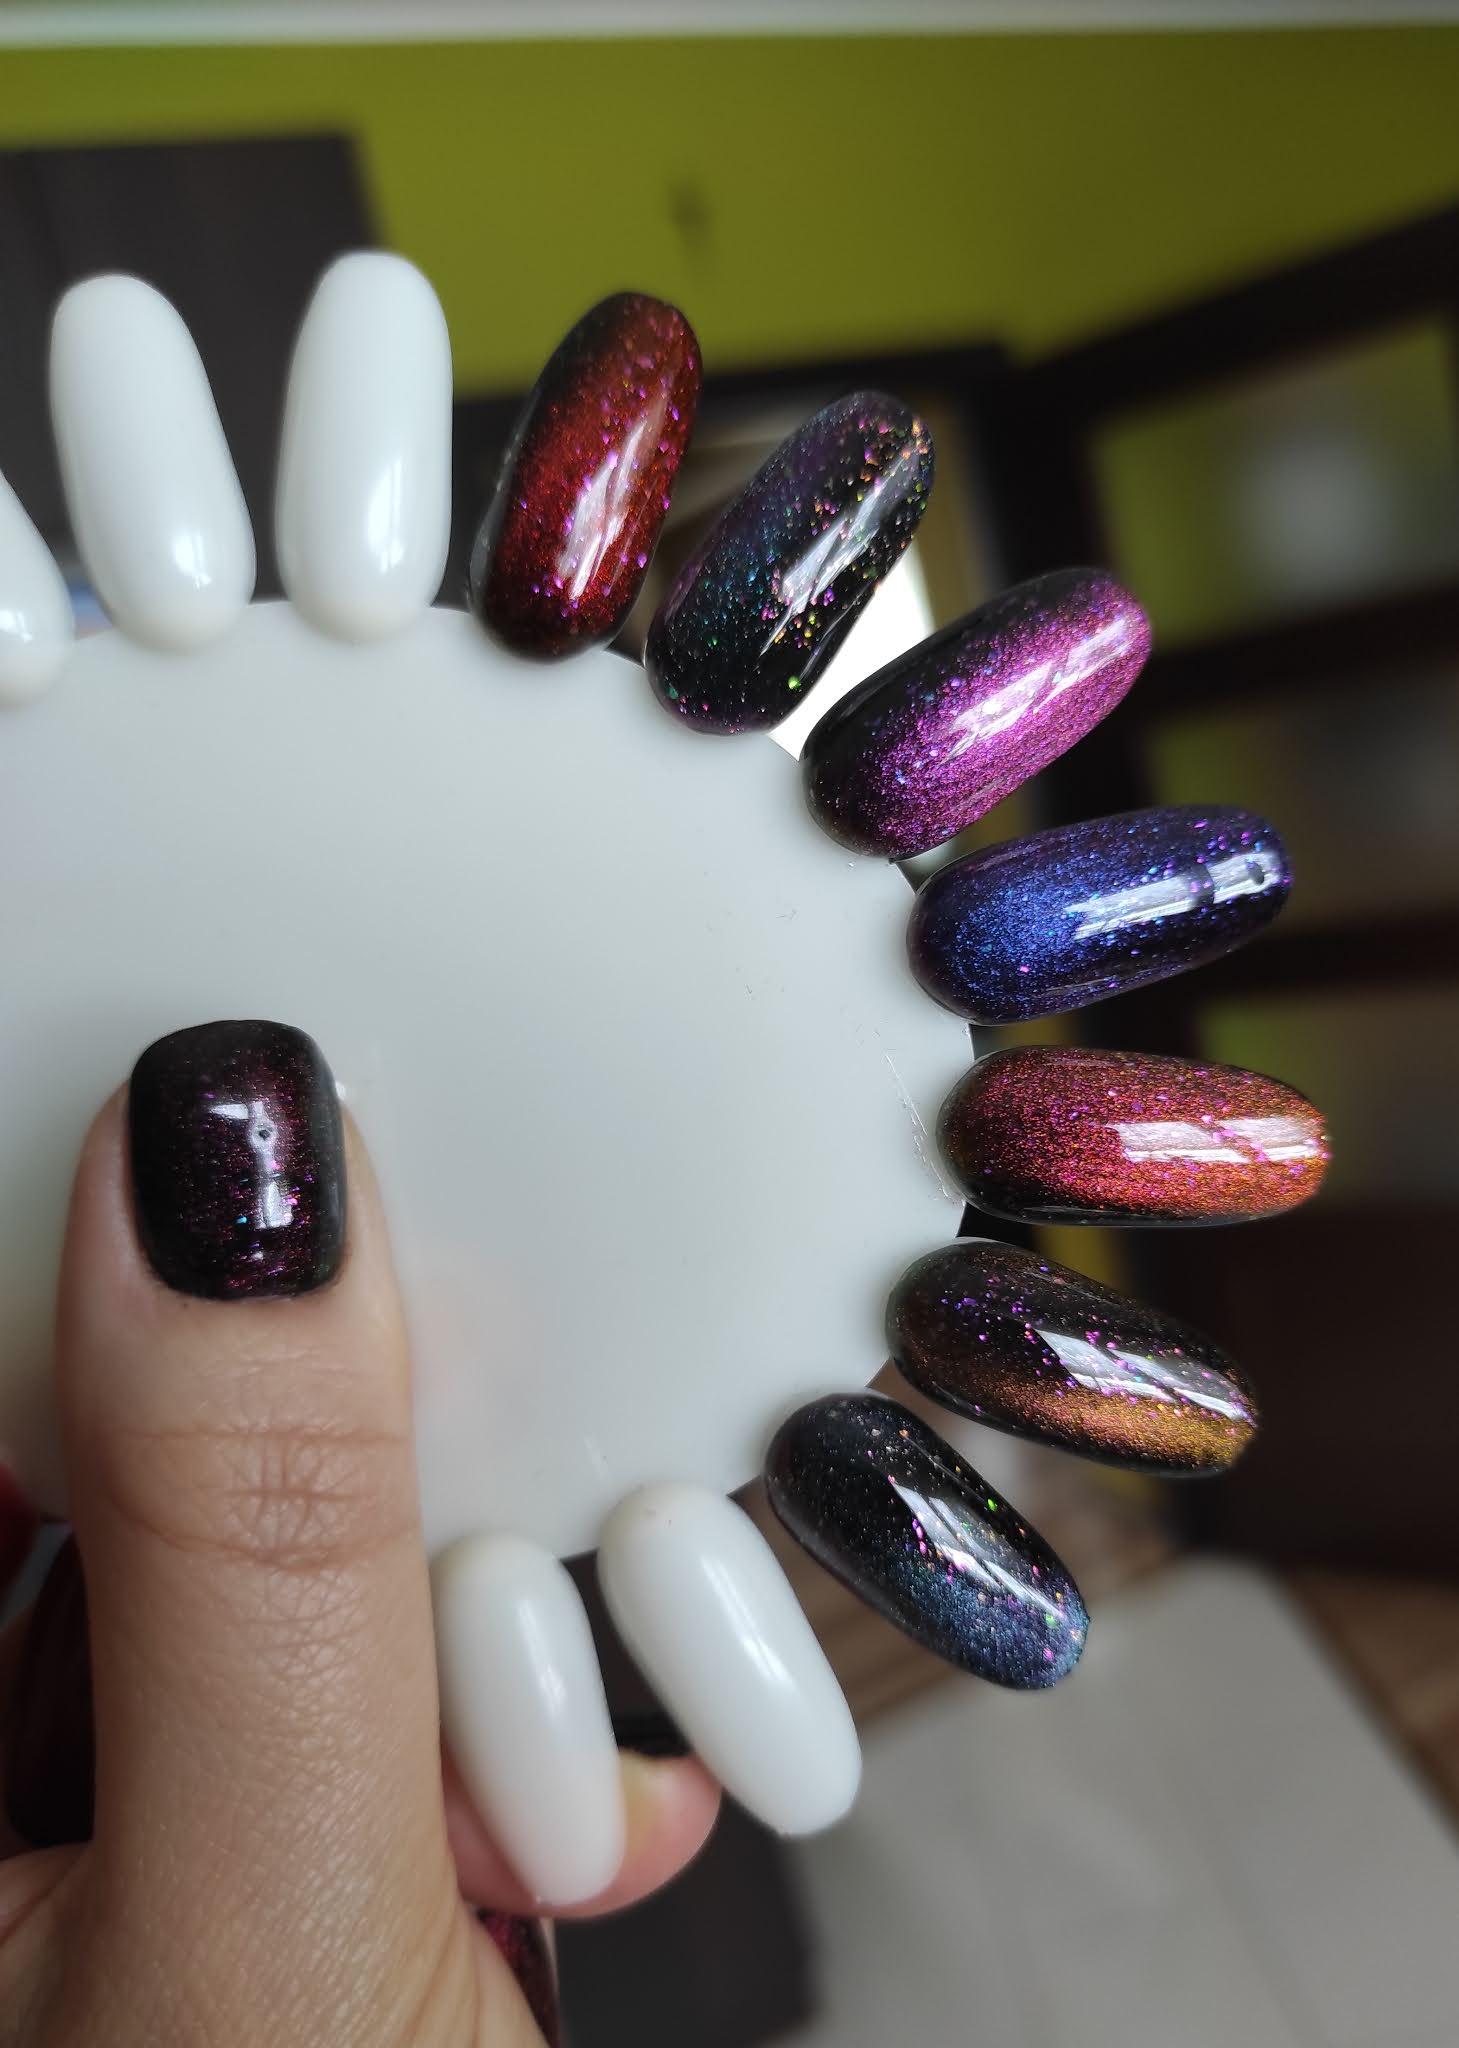 Iguana Magnetique Nc Nails Company - efekt z magnesem